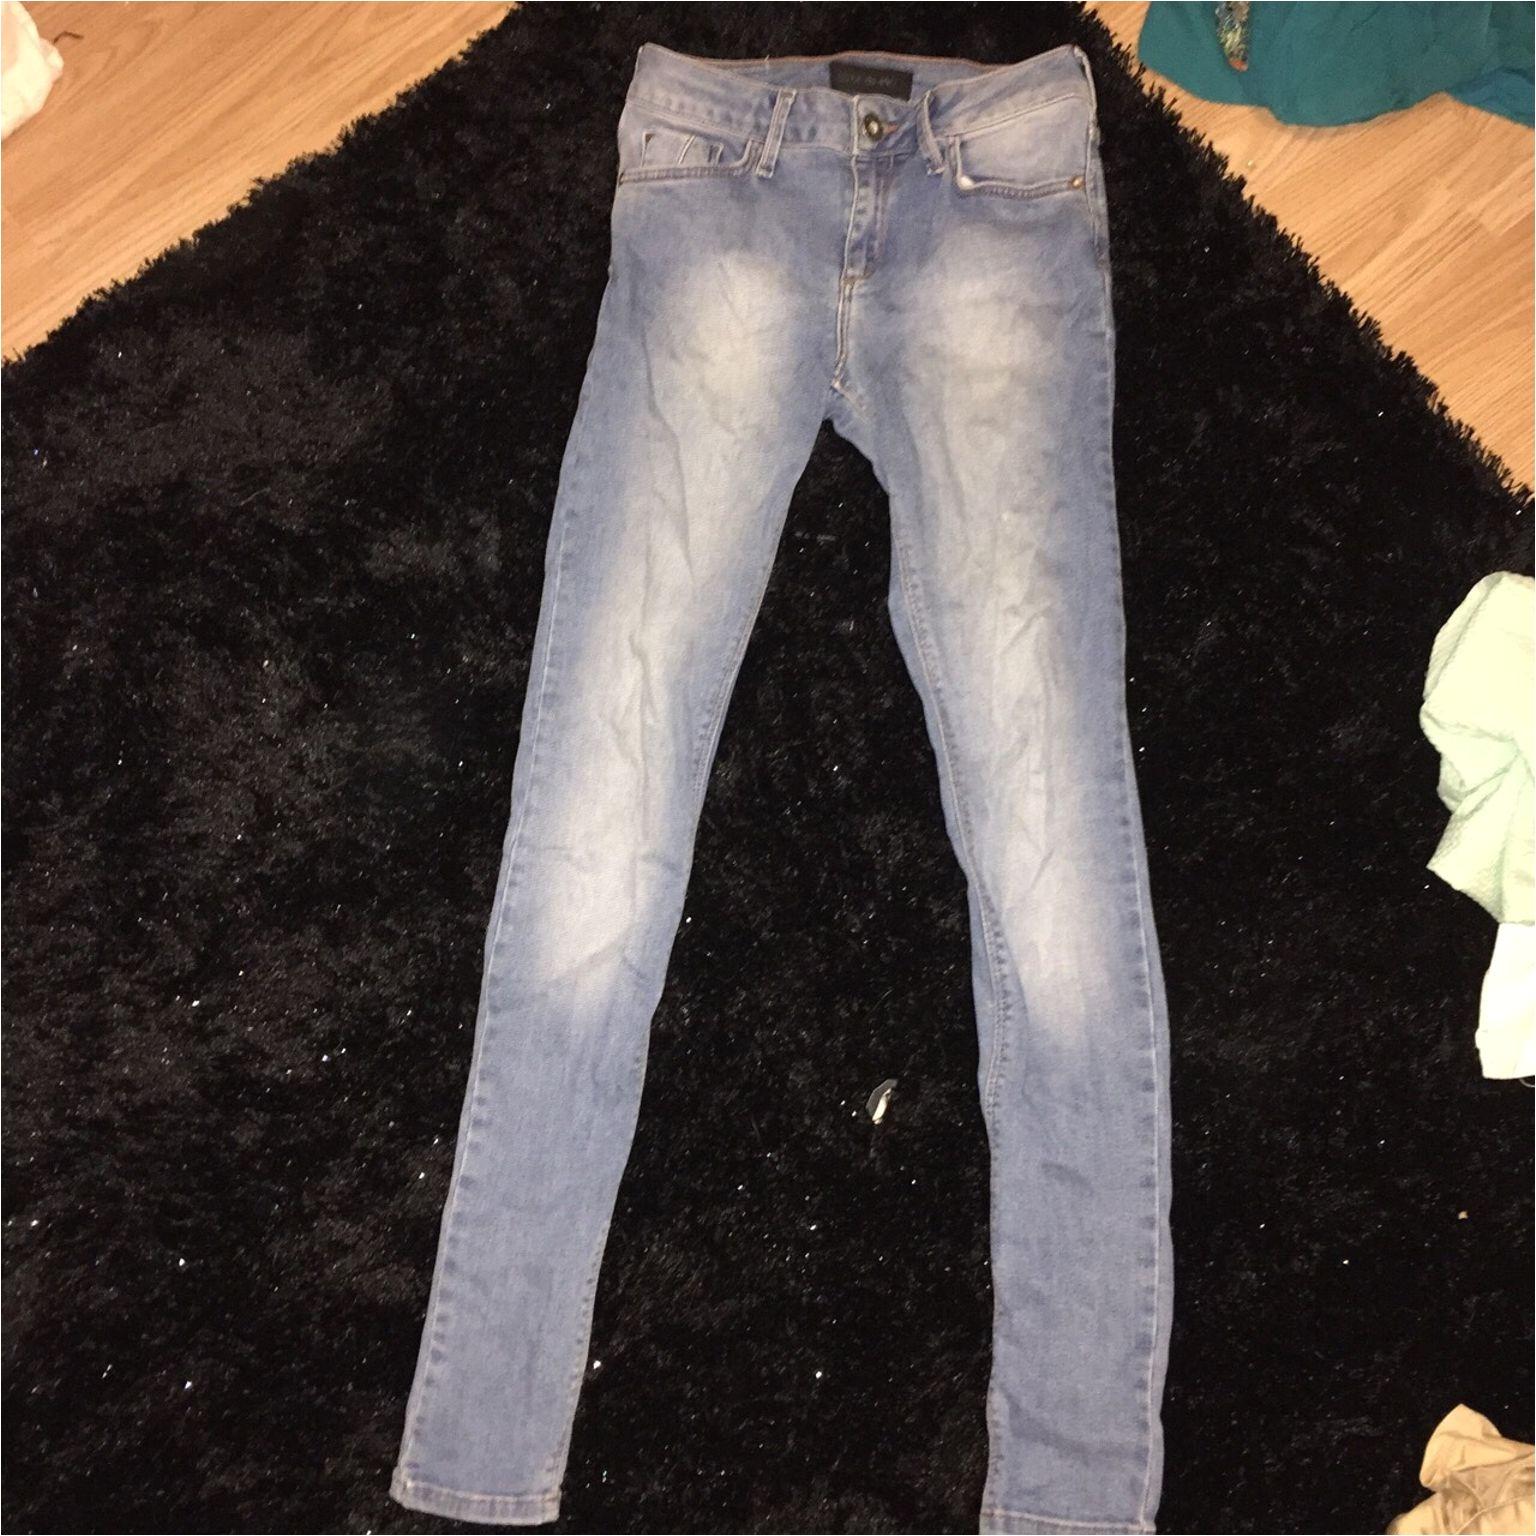 tahari floor lamp elegant river island skinny jeans 4ce5889d 15 lovely tahari floor lamp